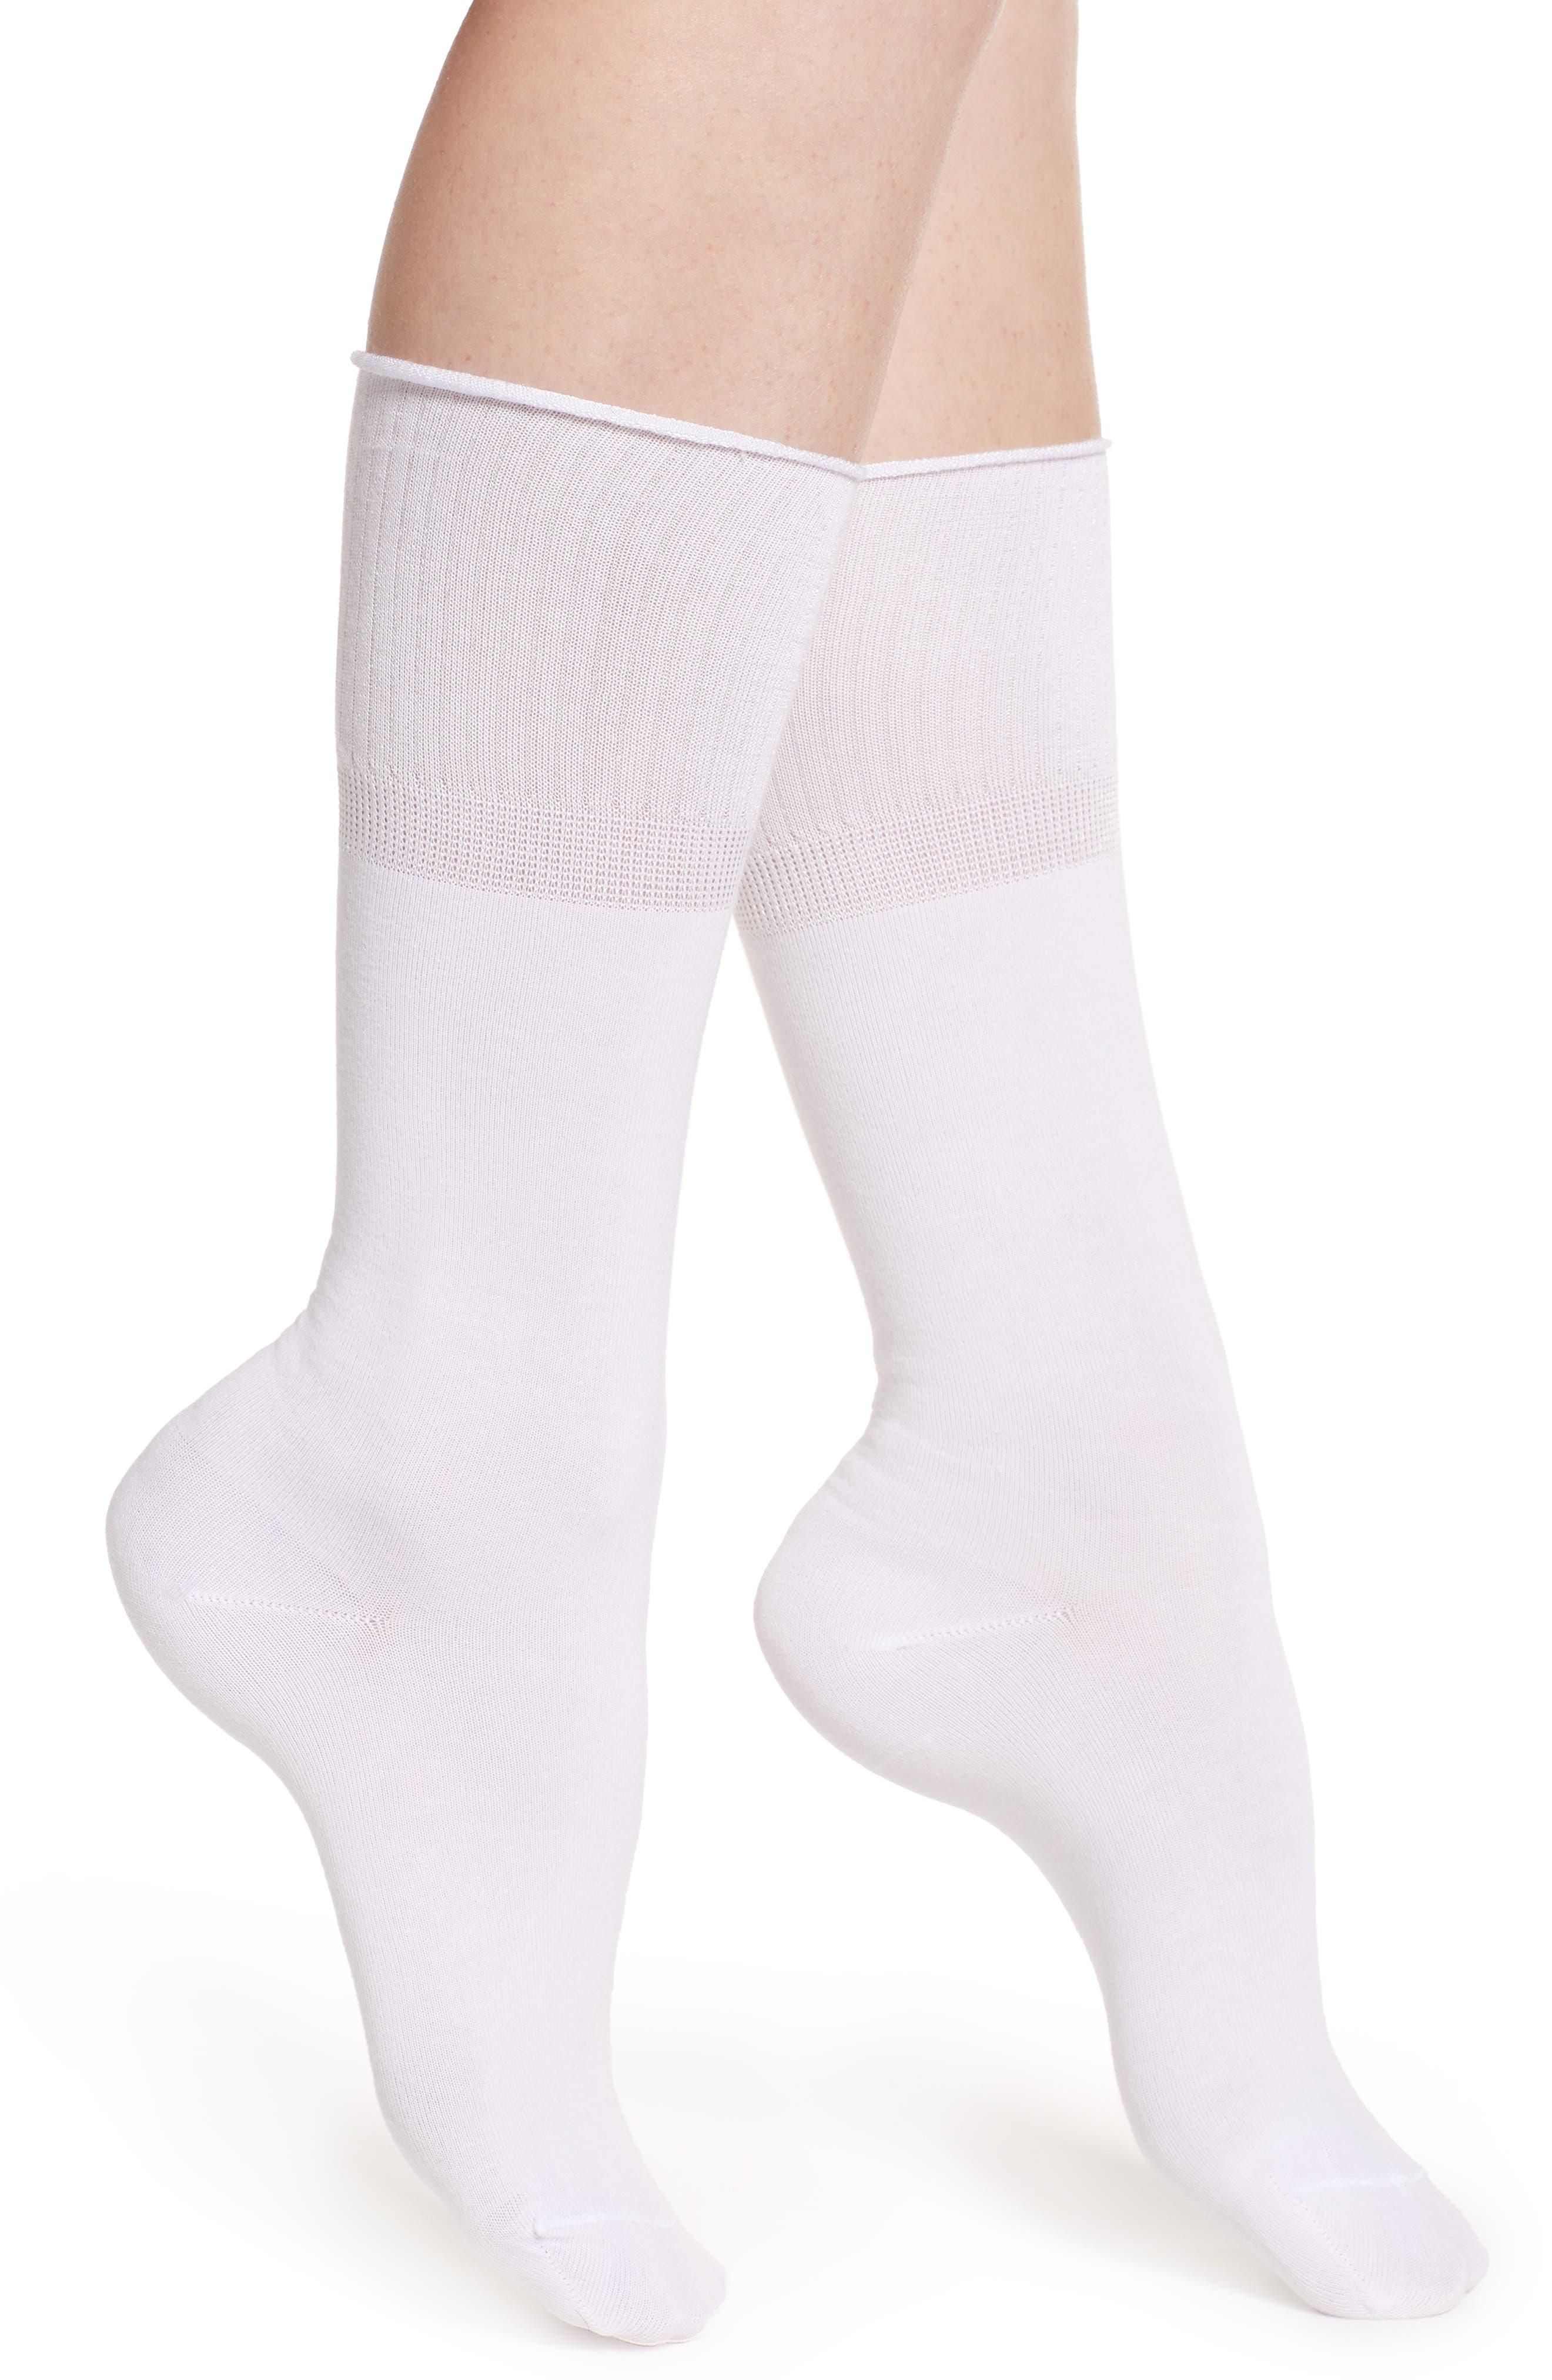 MAKE + MODEL, Dual Band Crew Socks, Main thumbnail 1, color, WHITE